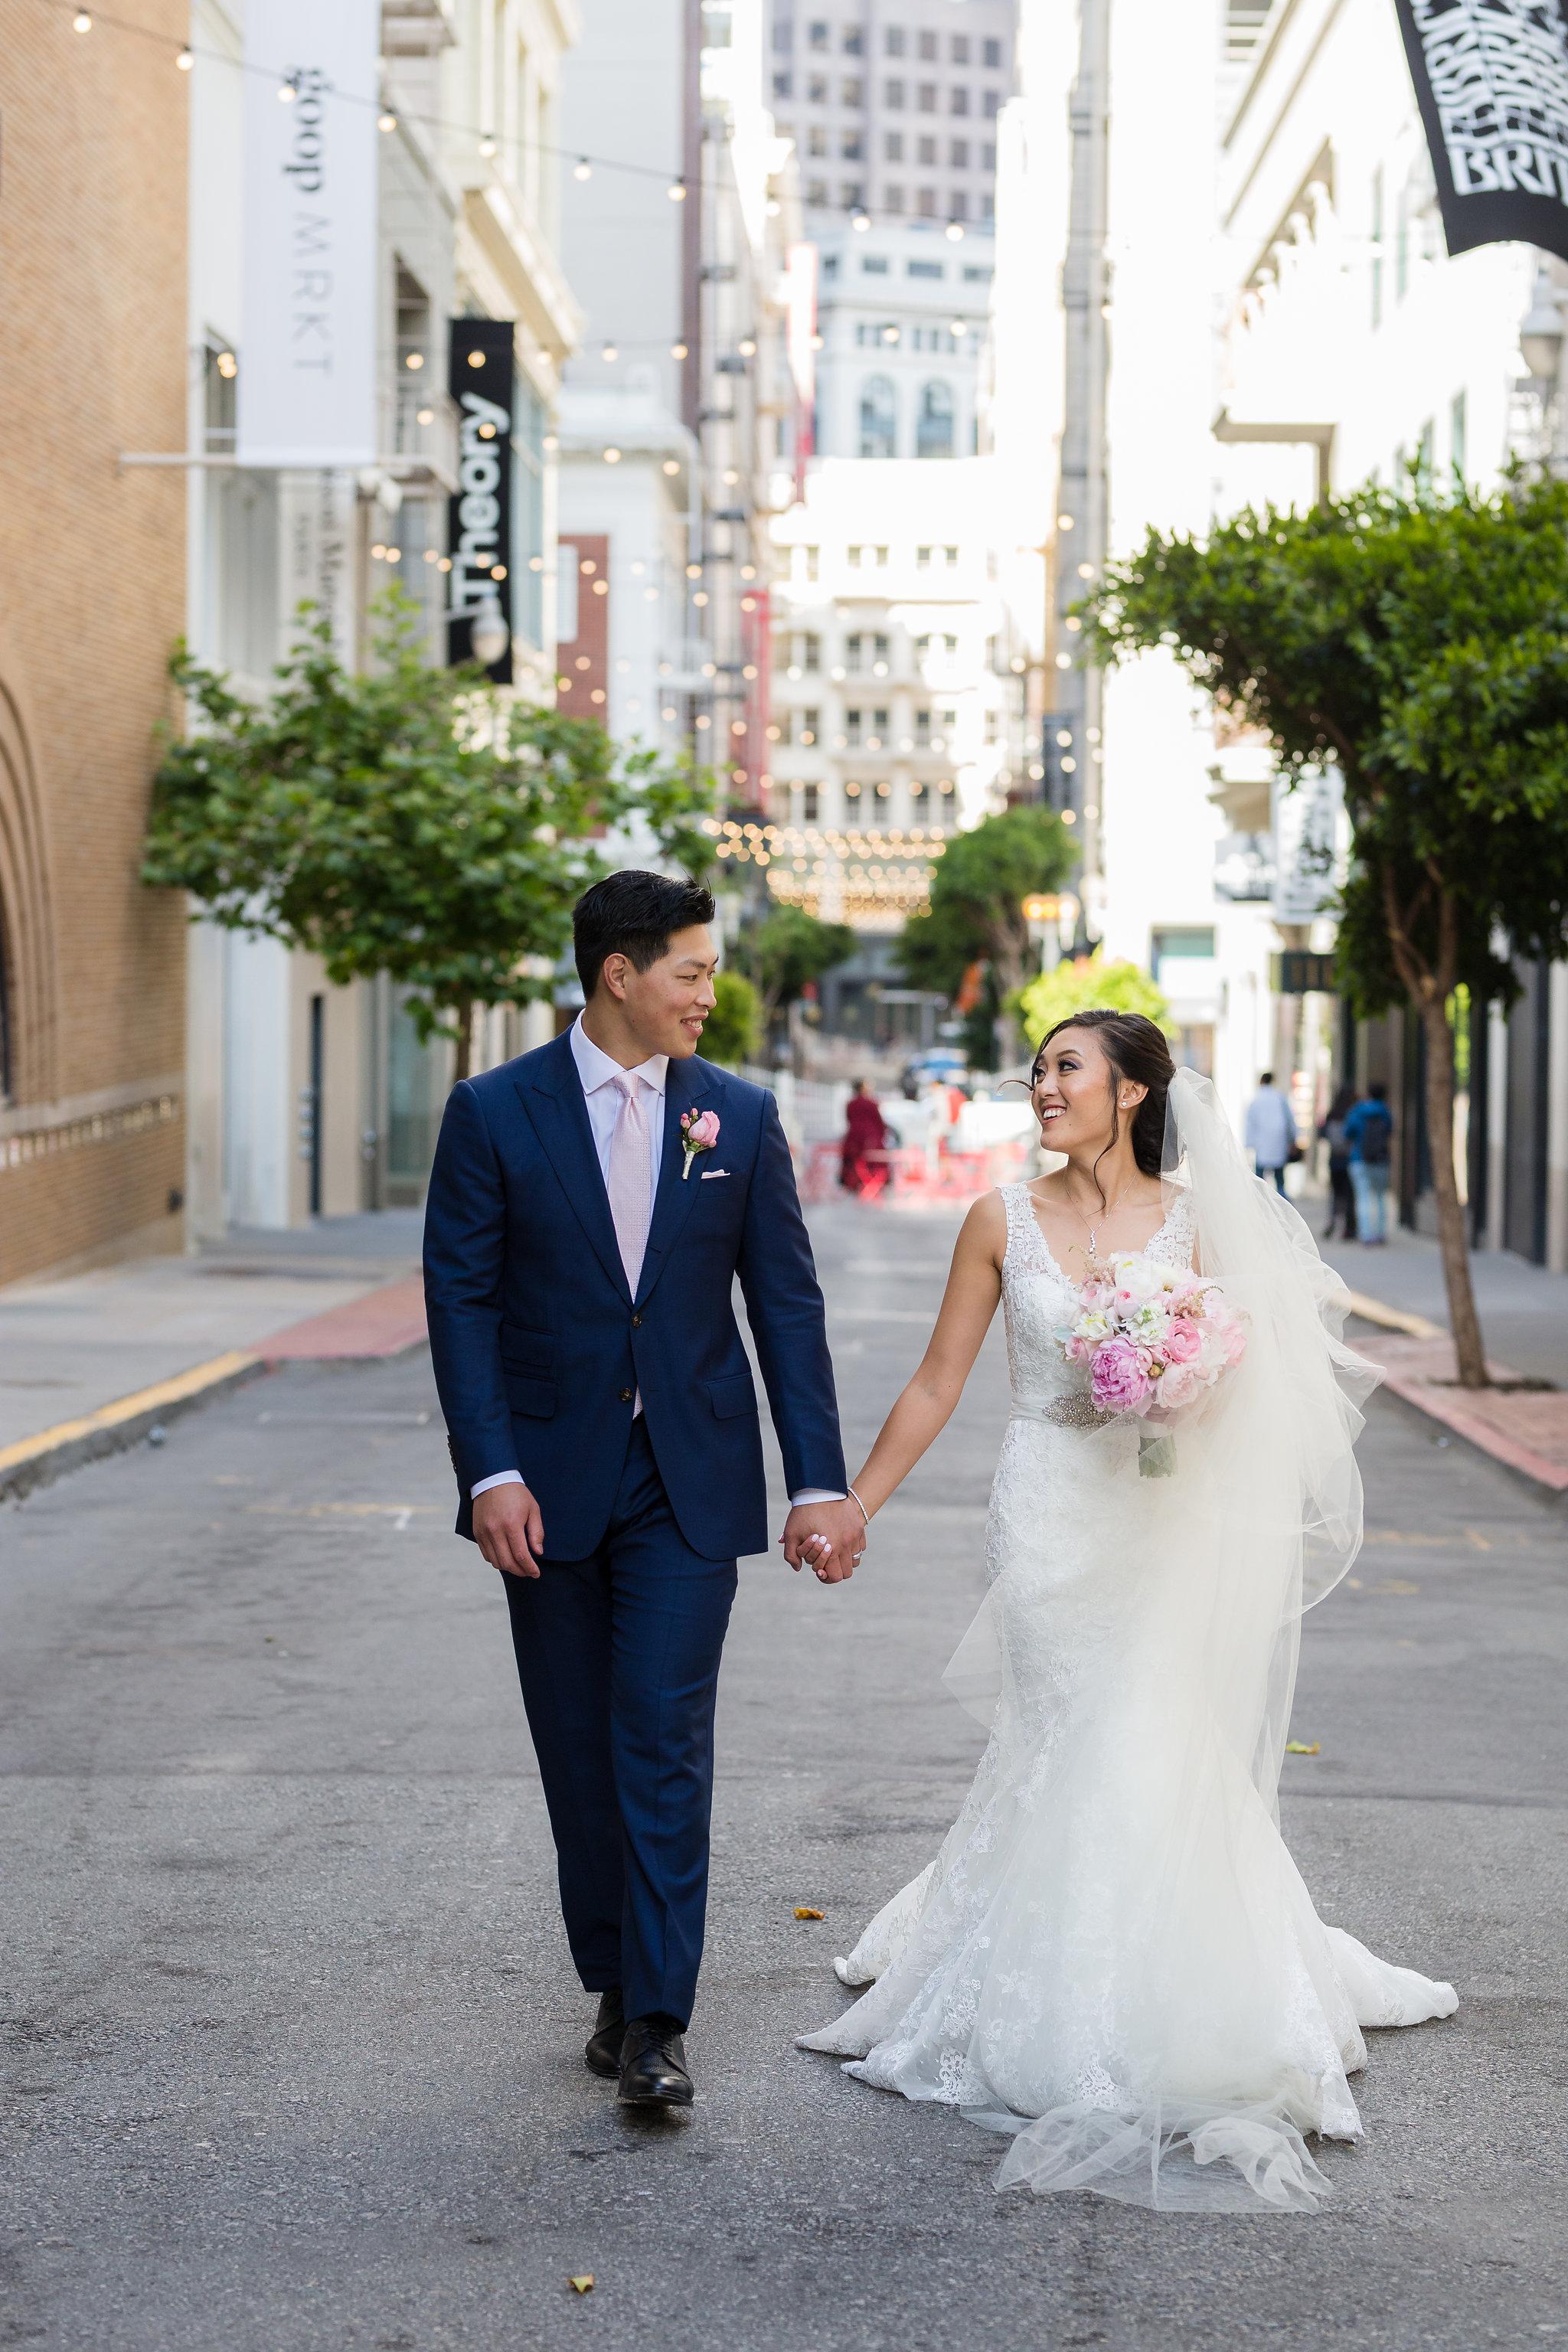 maiden lane san francisco wedding photography-23.jpg